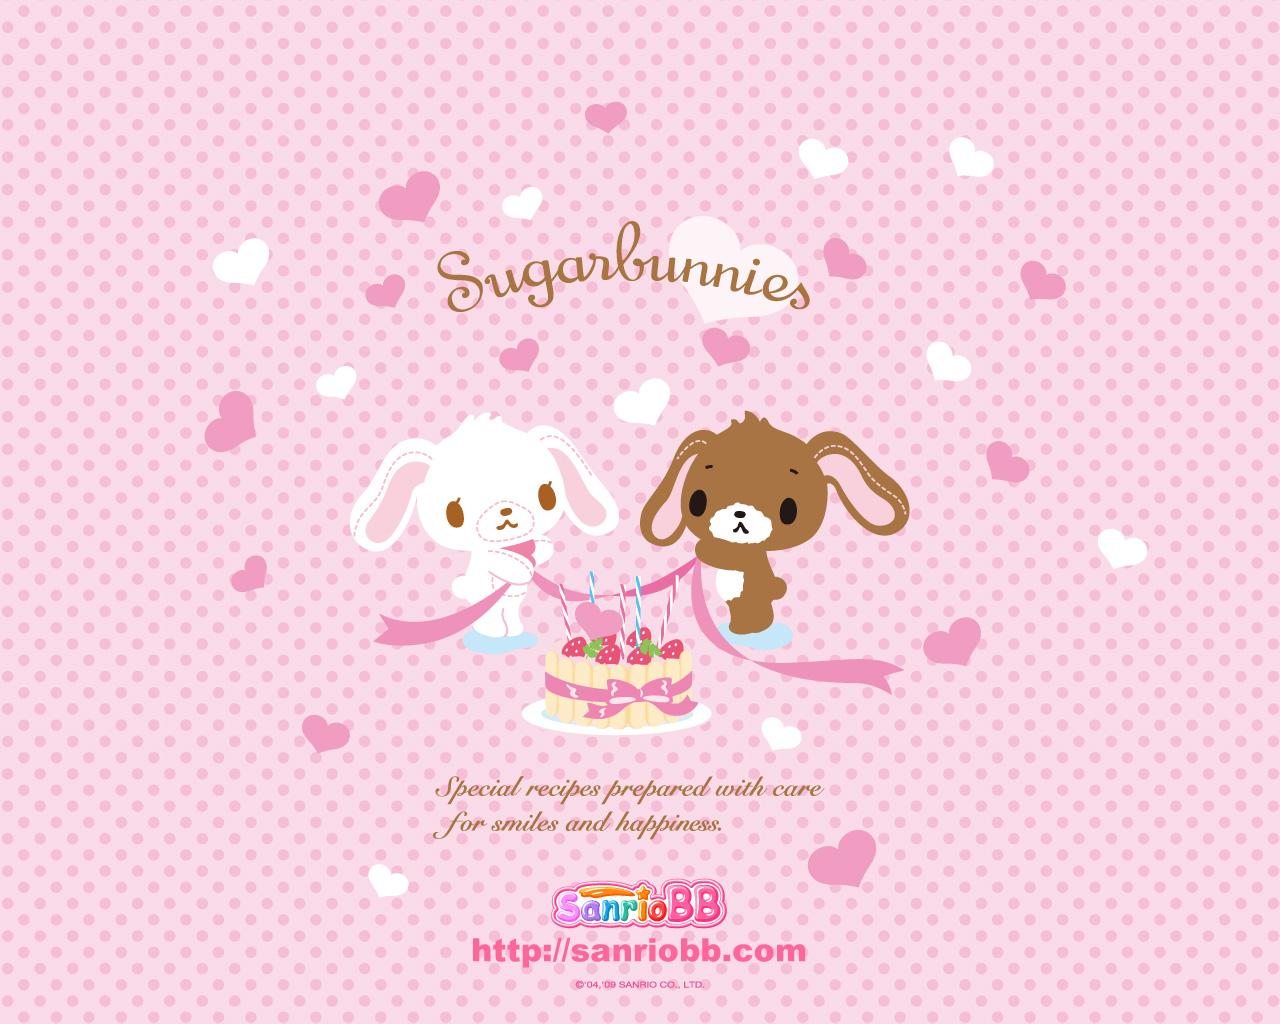 Wallpaper Sugar Bunnies Wallpaper 002 1280x1024